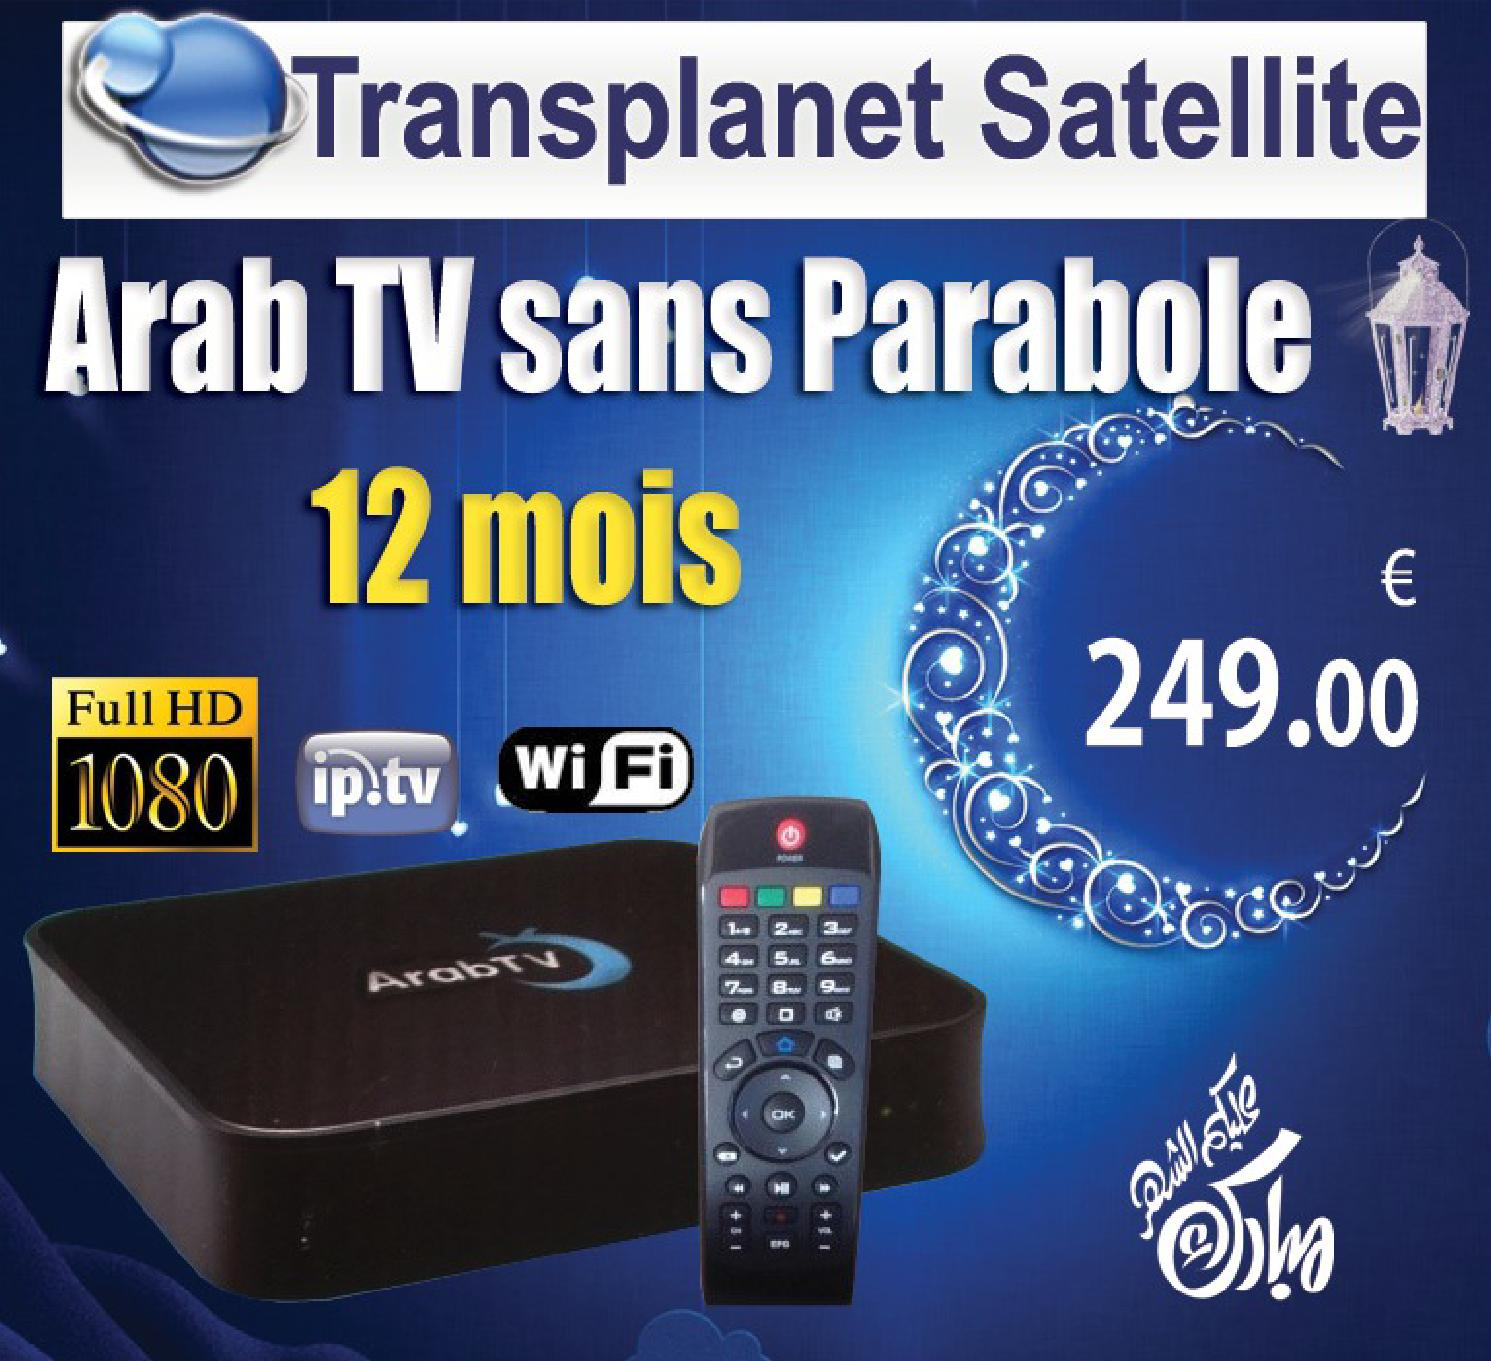 arab tv sans parabole sp cial ramadan 2014 by transplanet. Black Bedroom Furniture Sets. Home Design Ideas